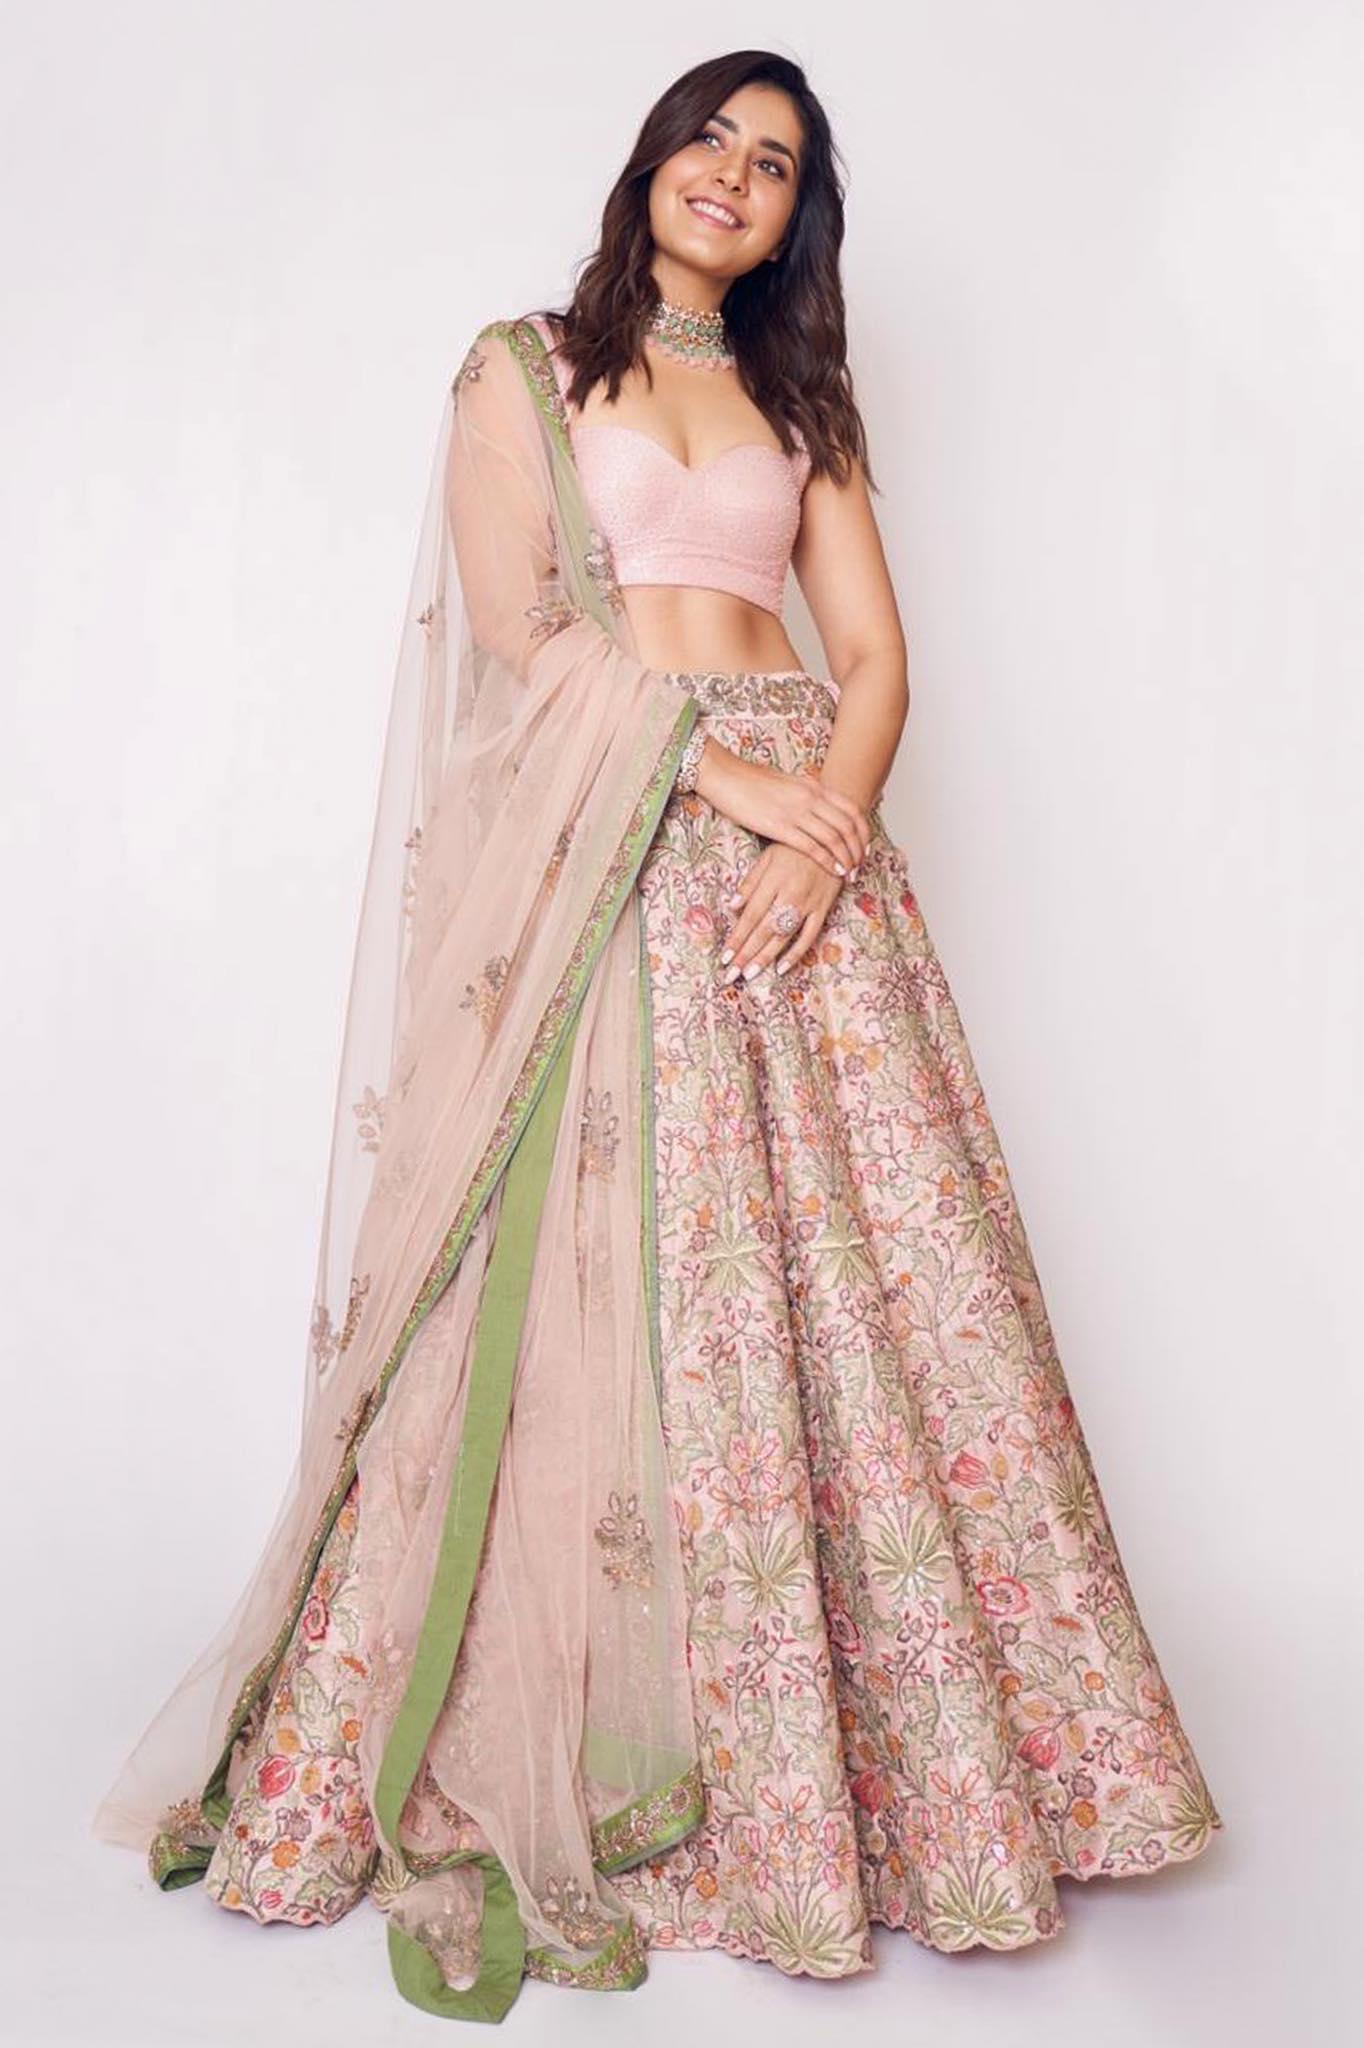 Raashi Khanna in a breathtakingly elegant lehenga with floral embroidery from Shyamal Bhumika Spring 2020 collection.  Raashi Khanna Outfit- Shyamal Bhumika. Styled by- Ashwin ash. Photography- Eshaangirri. Makeup- Chaks. Hair- Venkatesh.